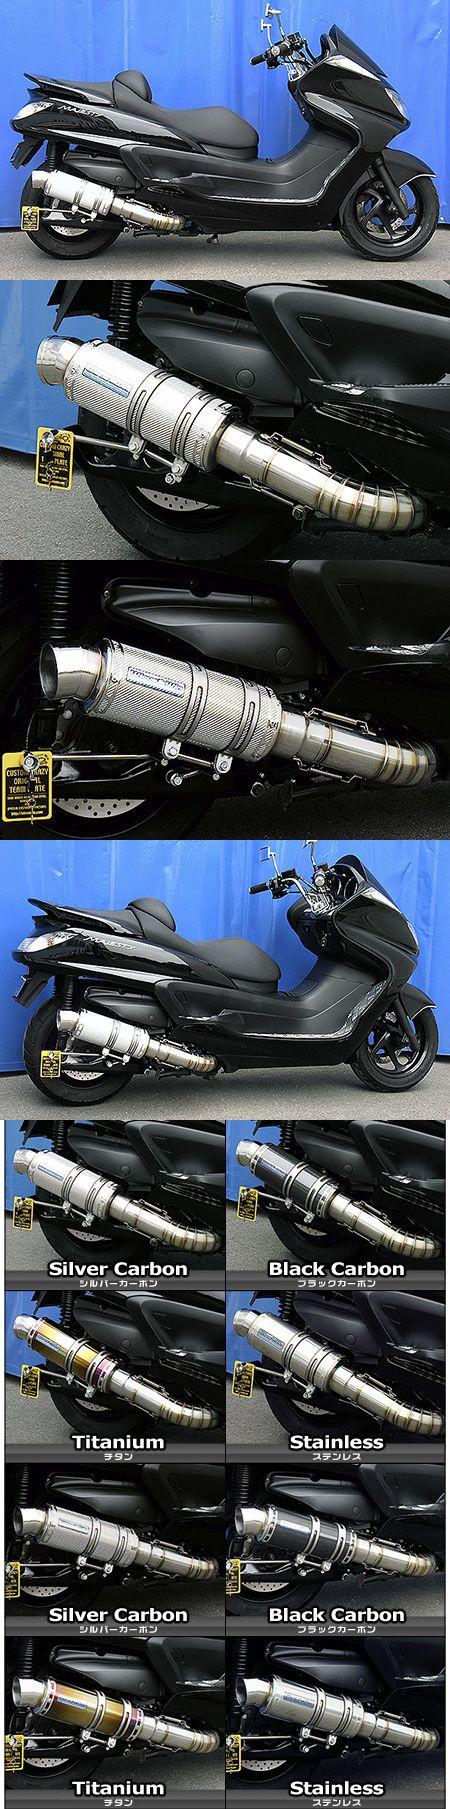 Premium全段排氣管 銀色碳纖維款式